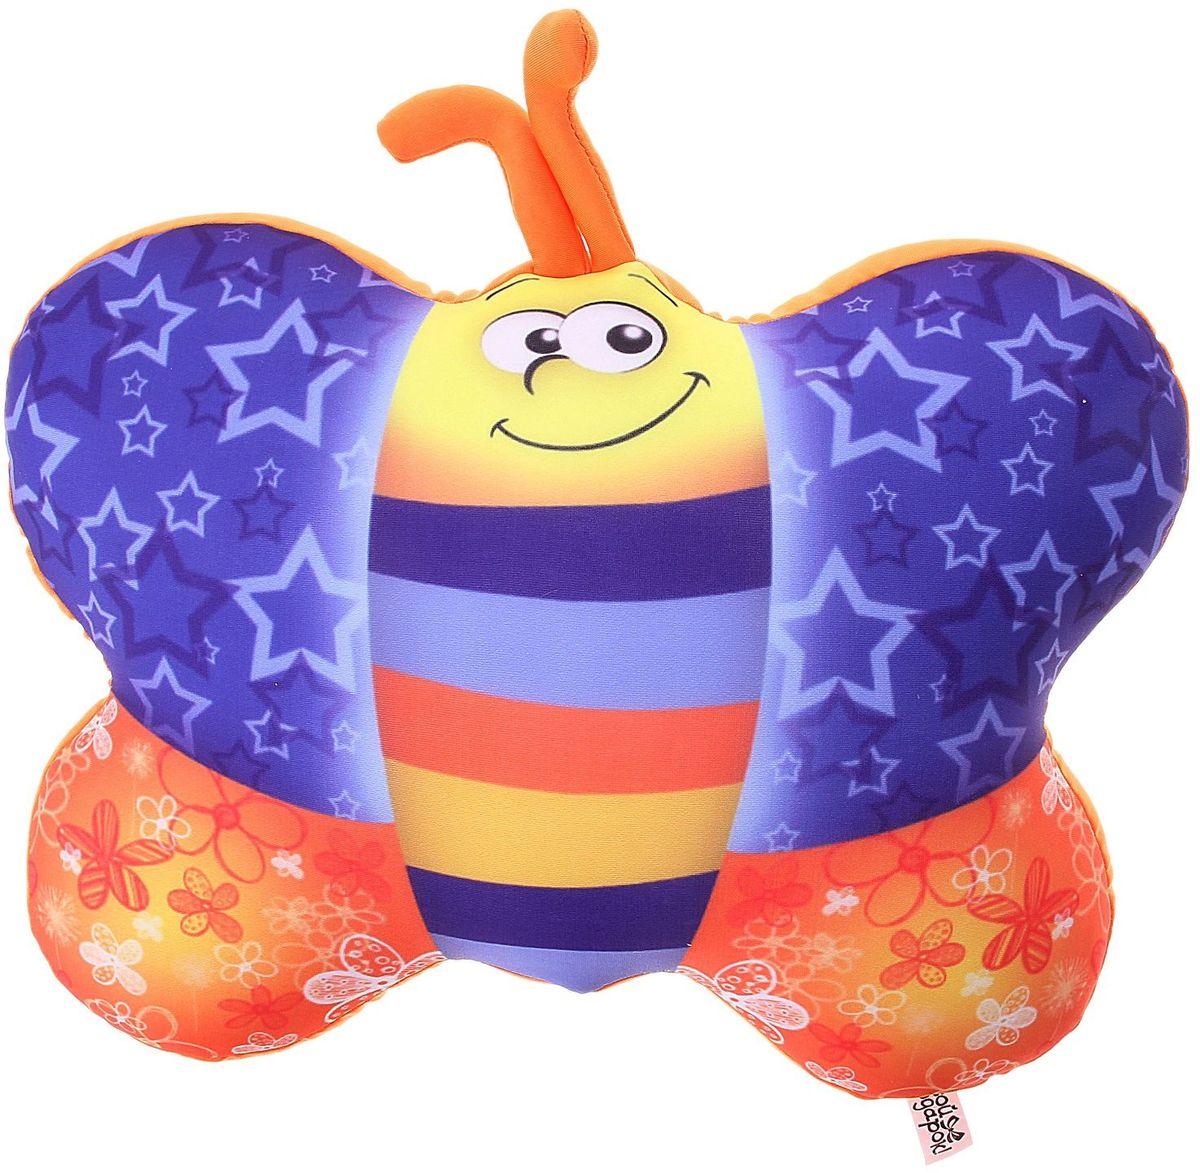 Sima-land Мягкая игрушка-антистресс Бабочка 330463 sima land мягкая игрушка антистресс губы целовашки 864936